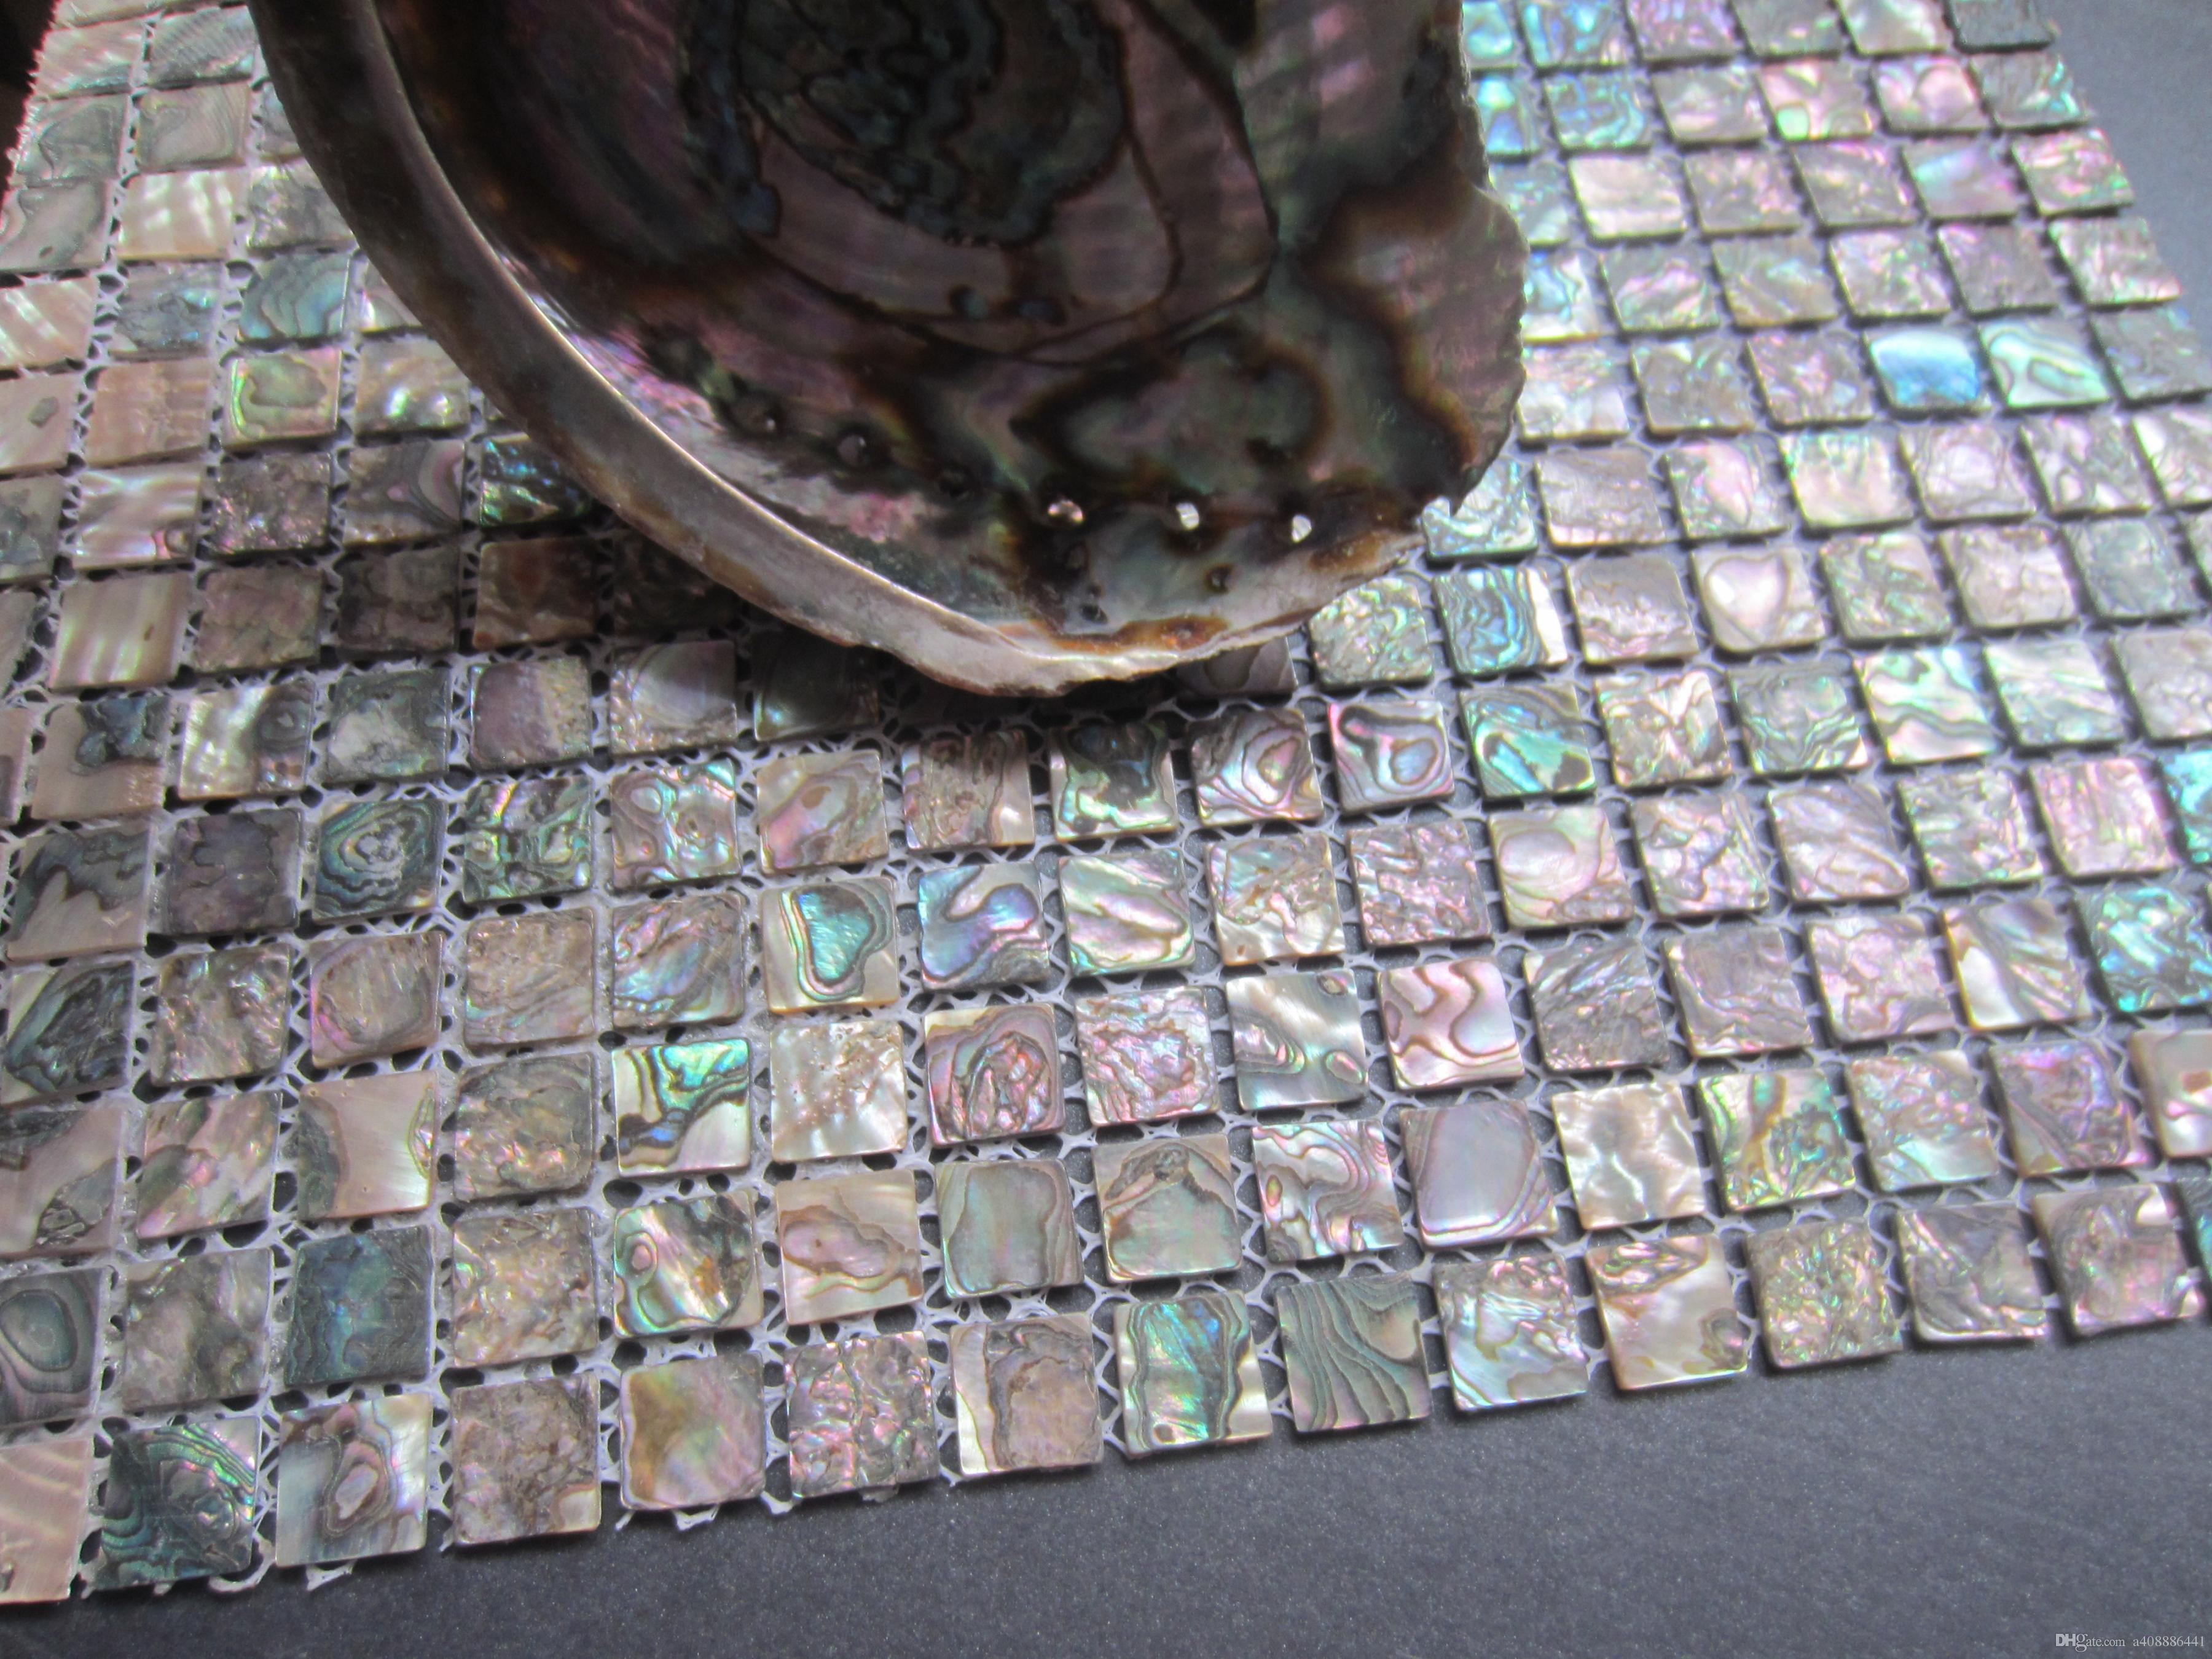 Acquista tessera mosaico abalone verde piastrelle backsplash